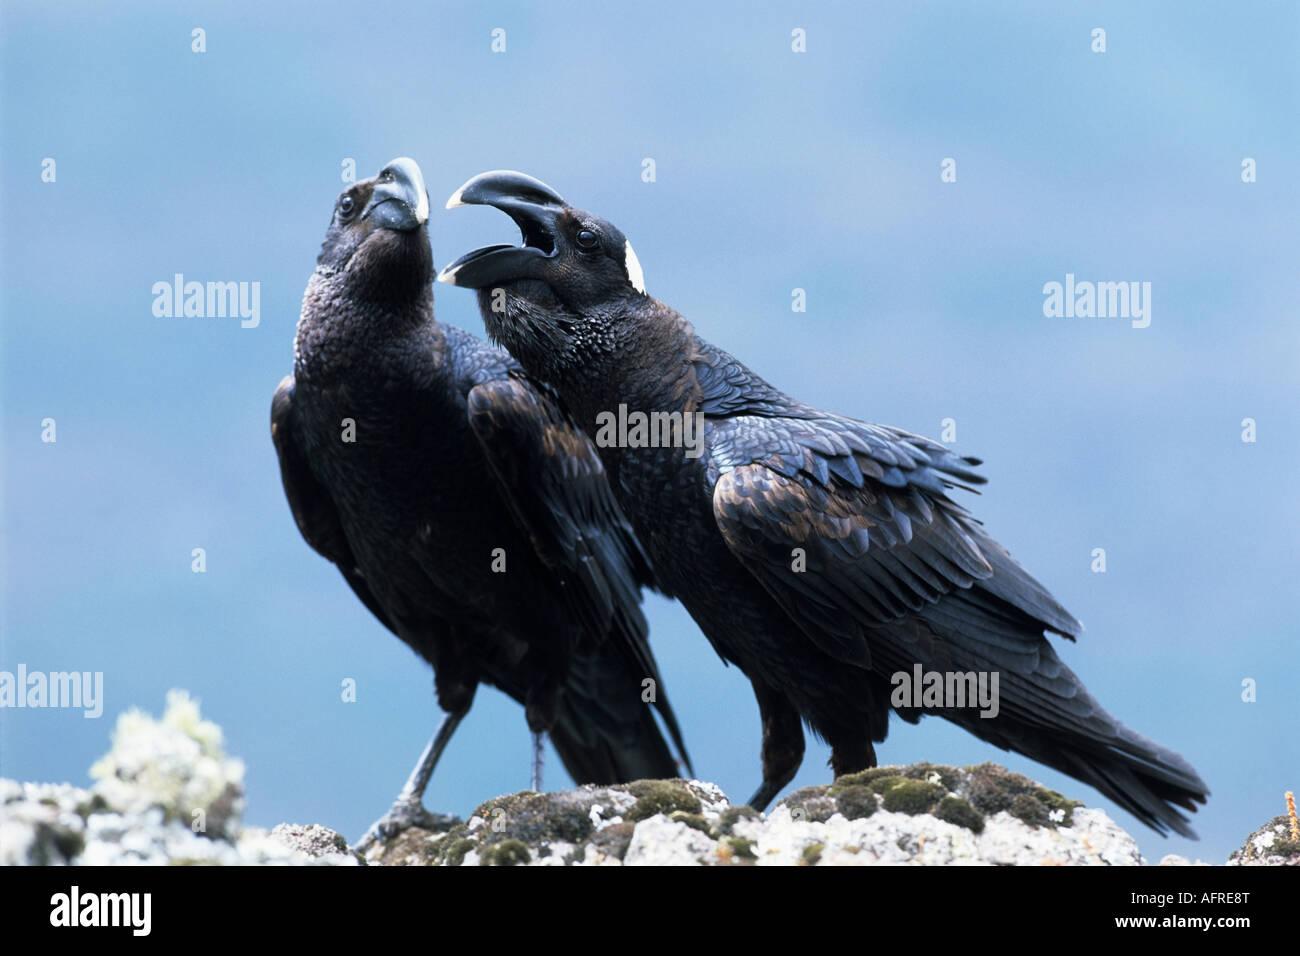 Pair of Thick billed Raven Corvus crassirostris largest songbird Semien Mountain Natinal Park - Stock Image